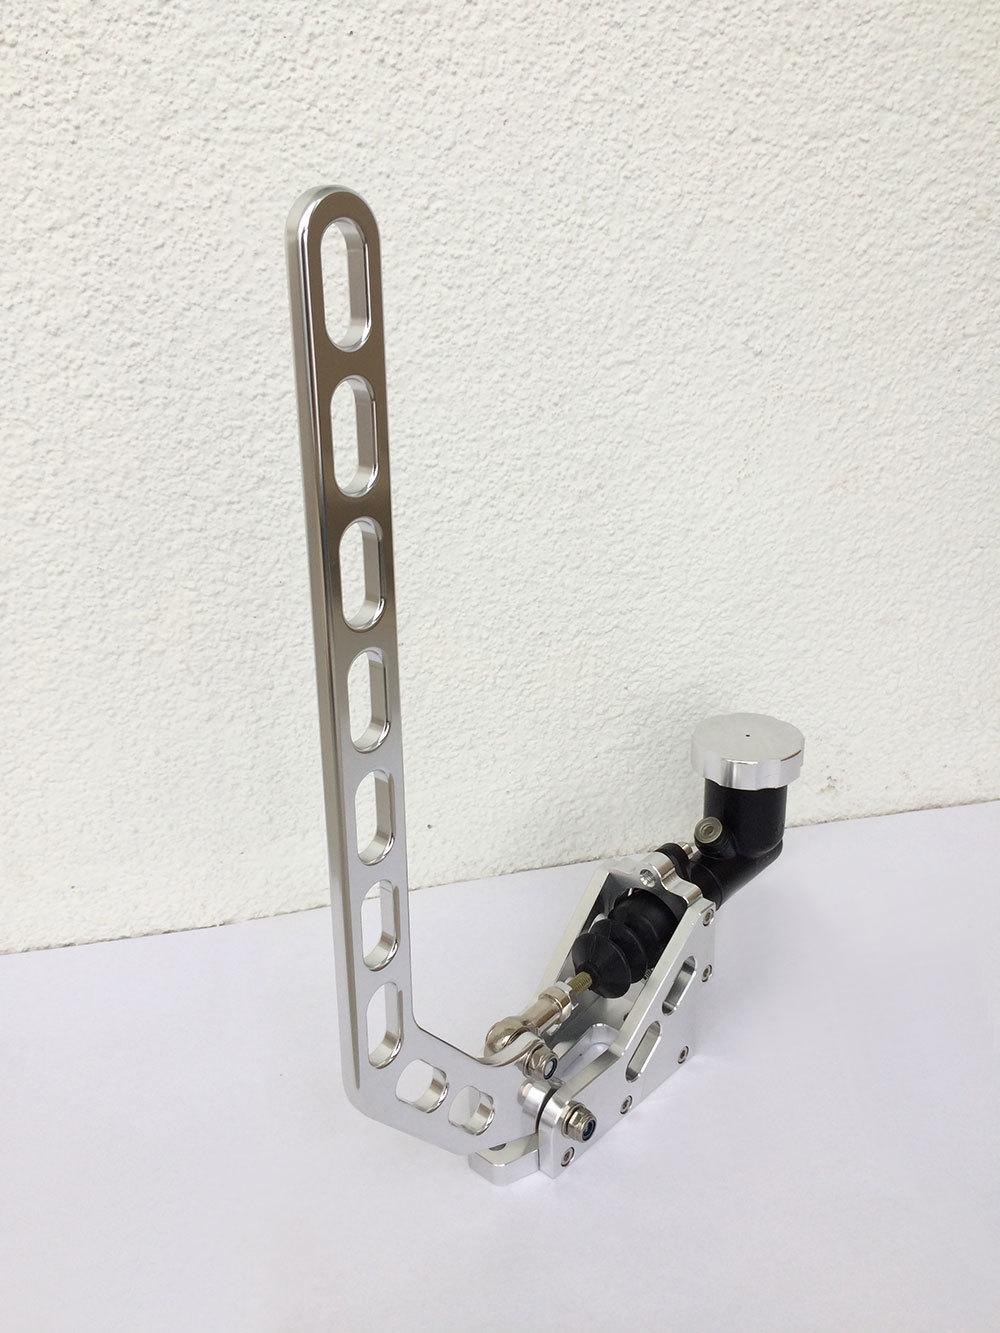 Hydraulic handbrake vertical